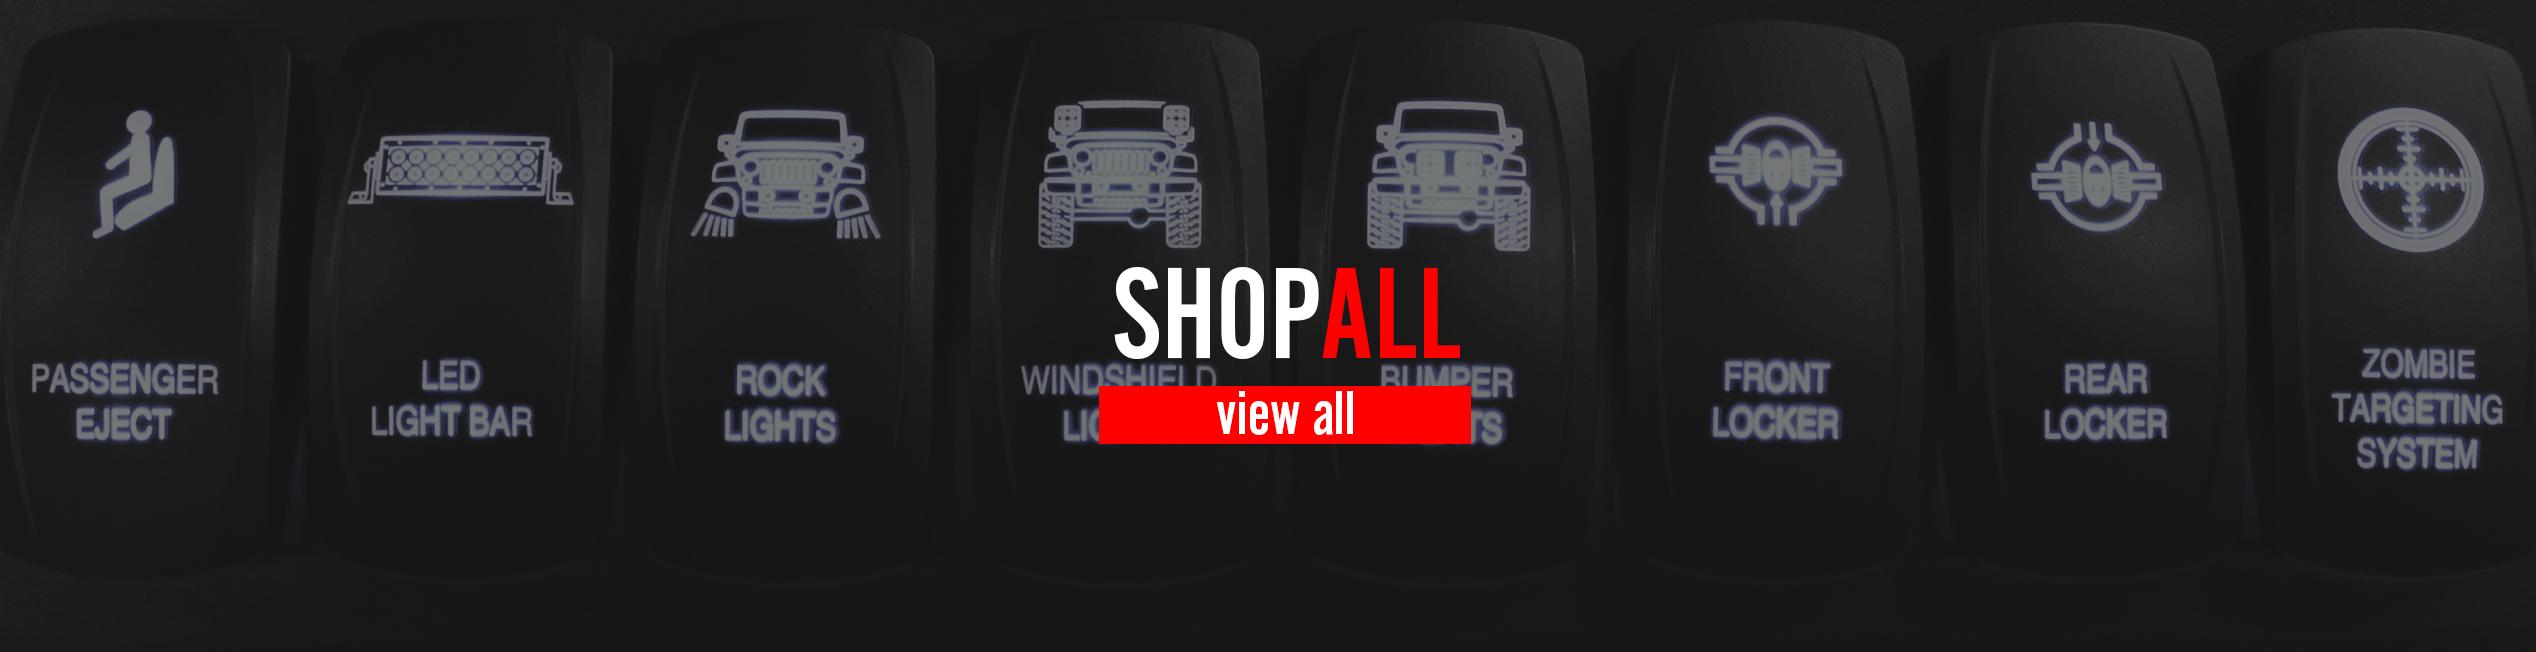 4x4 Spod 1999 Jeep Cherokee Hood Light Wiring Diagram Shopjeep